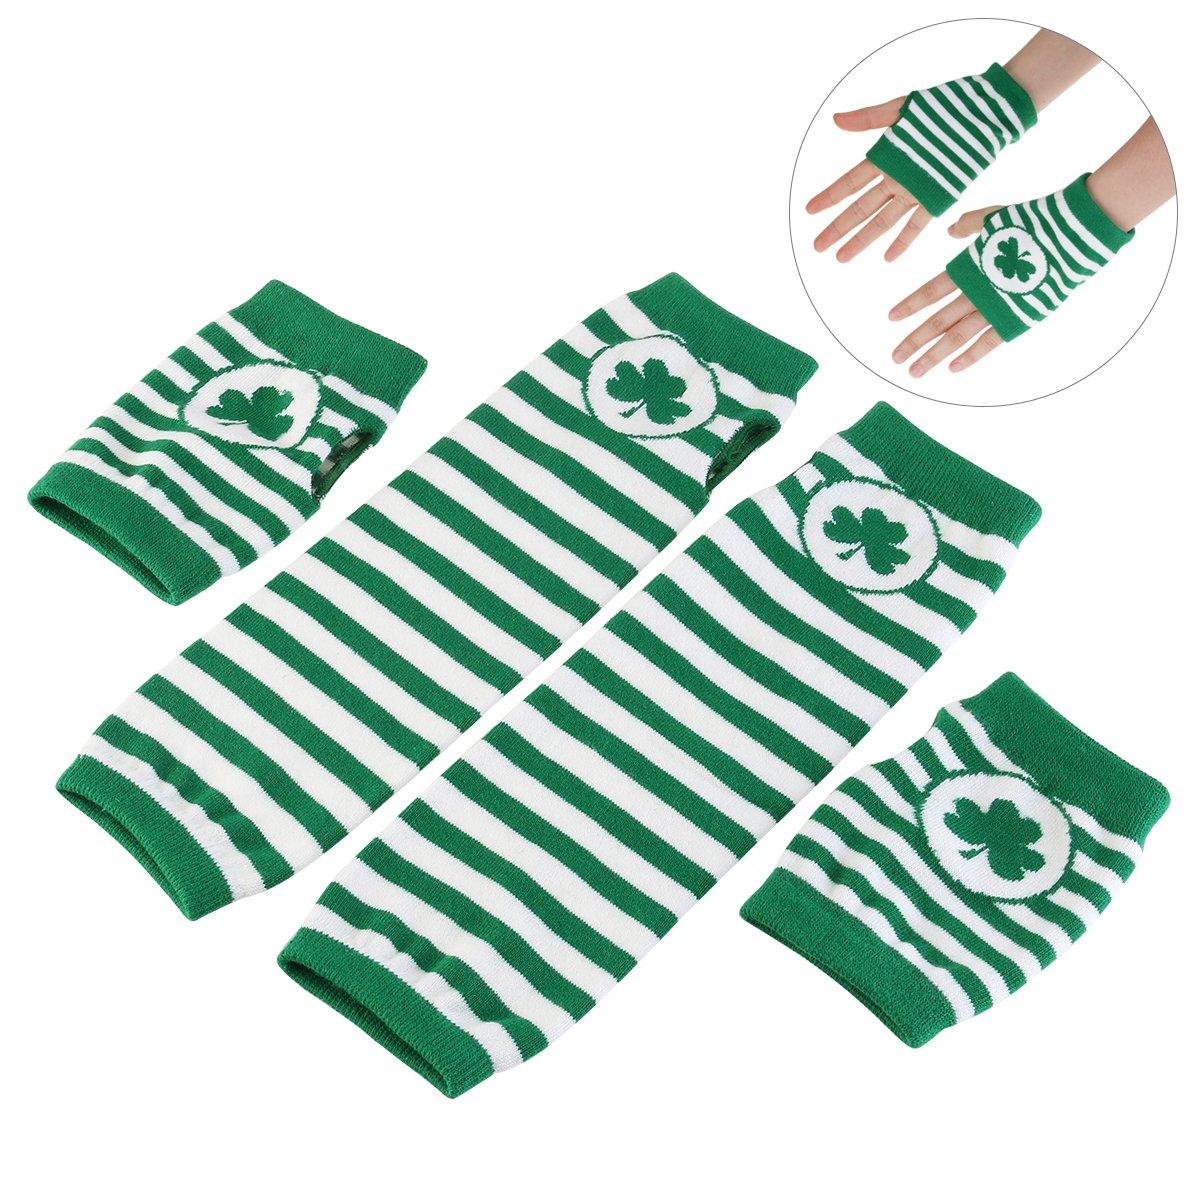 BESTOMZ St. Patrick's Day Gloves Shamrock Fingerless Arm Warmers Unisex - 2 Pair